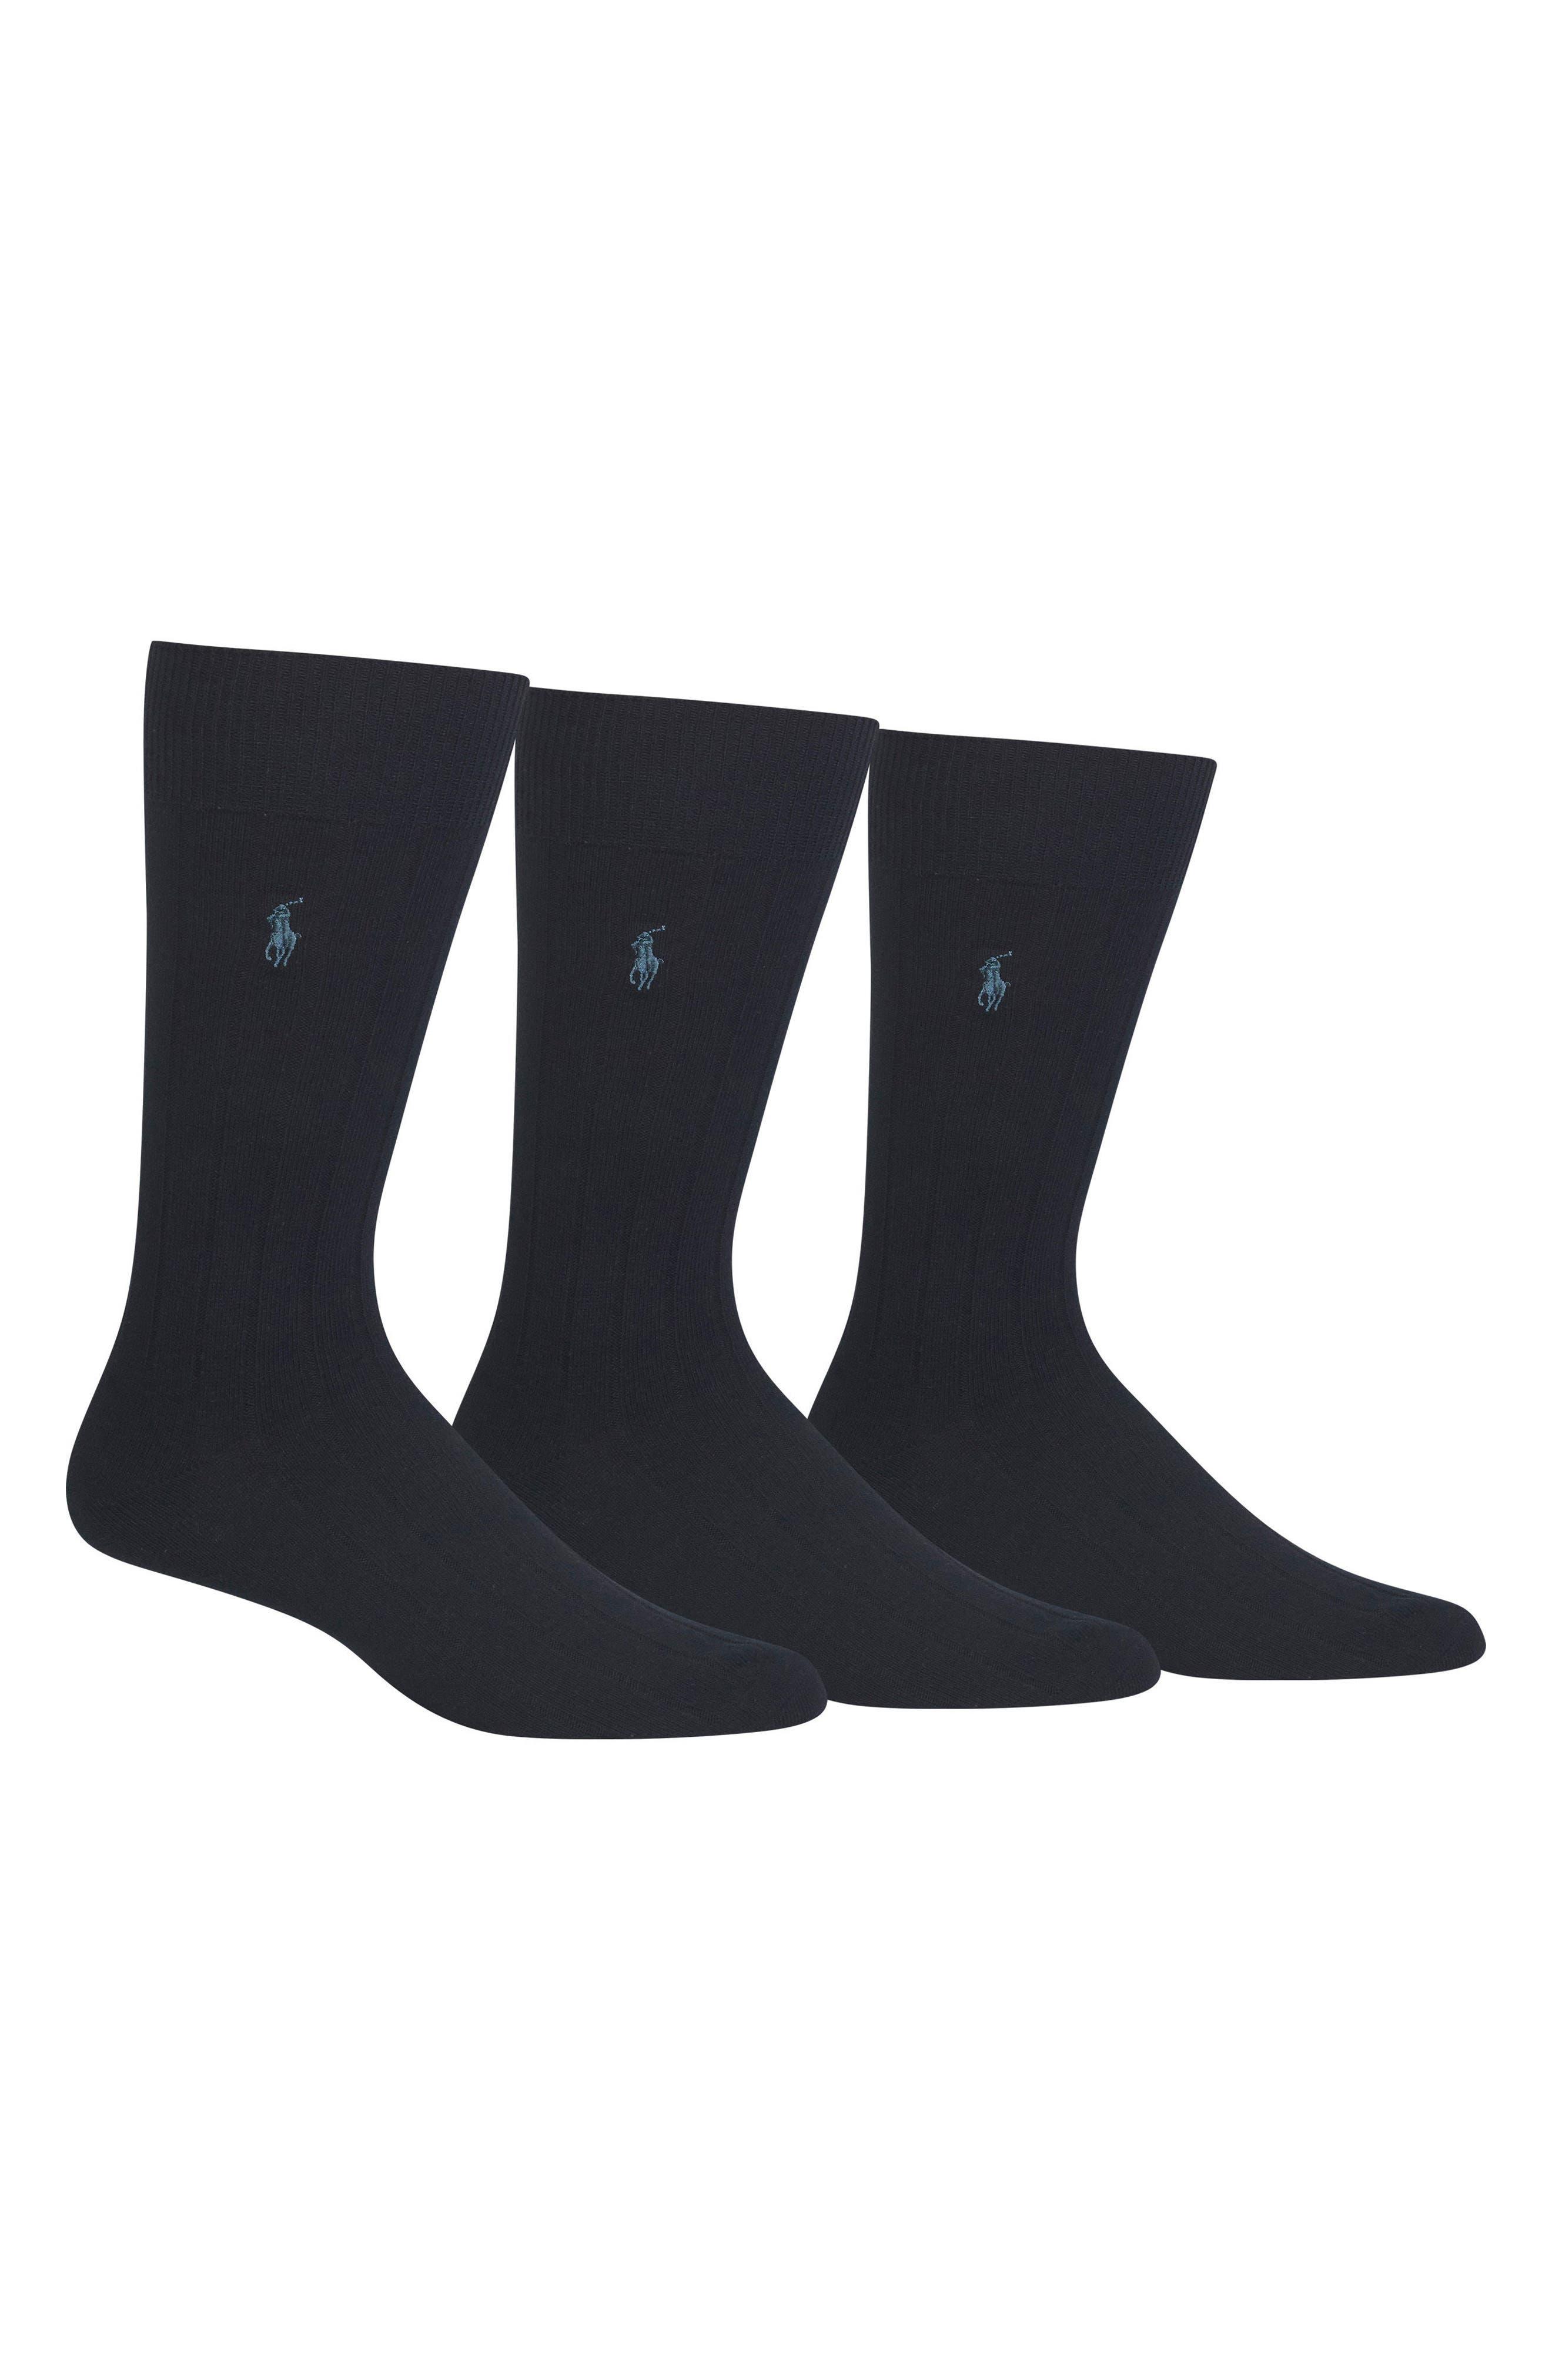 POLO RALPH LAUREN 3-Pack Crew Socks, Main, color, NAVY